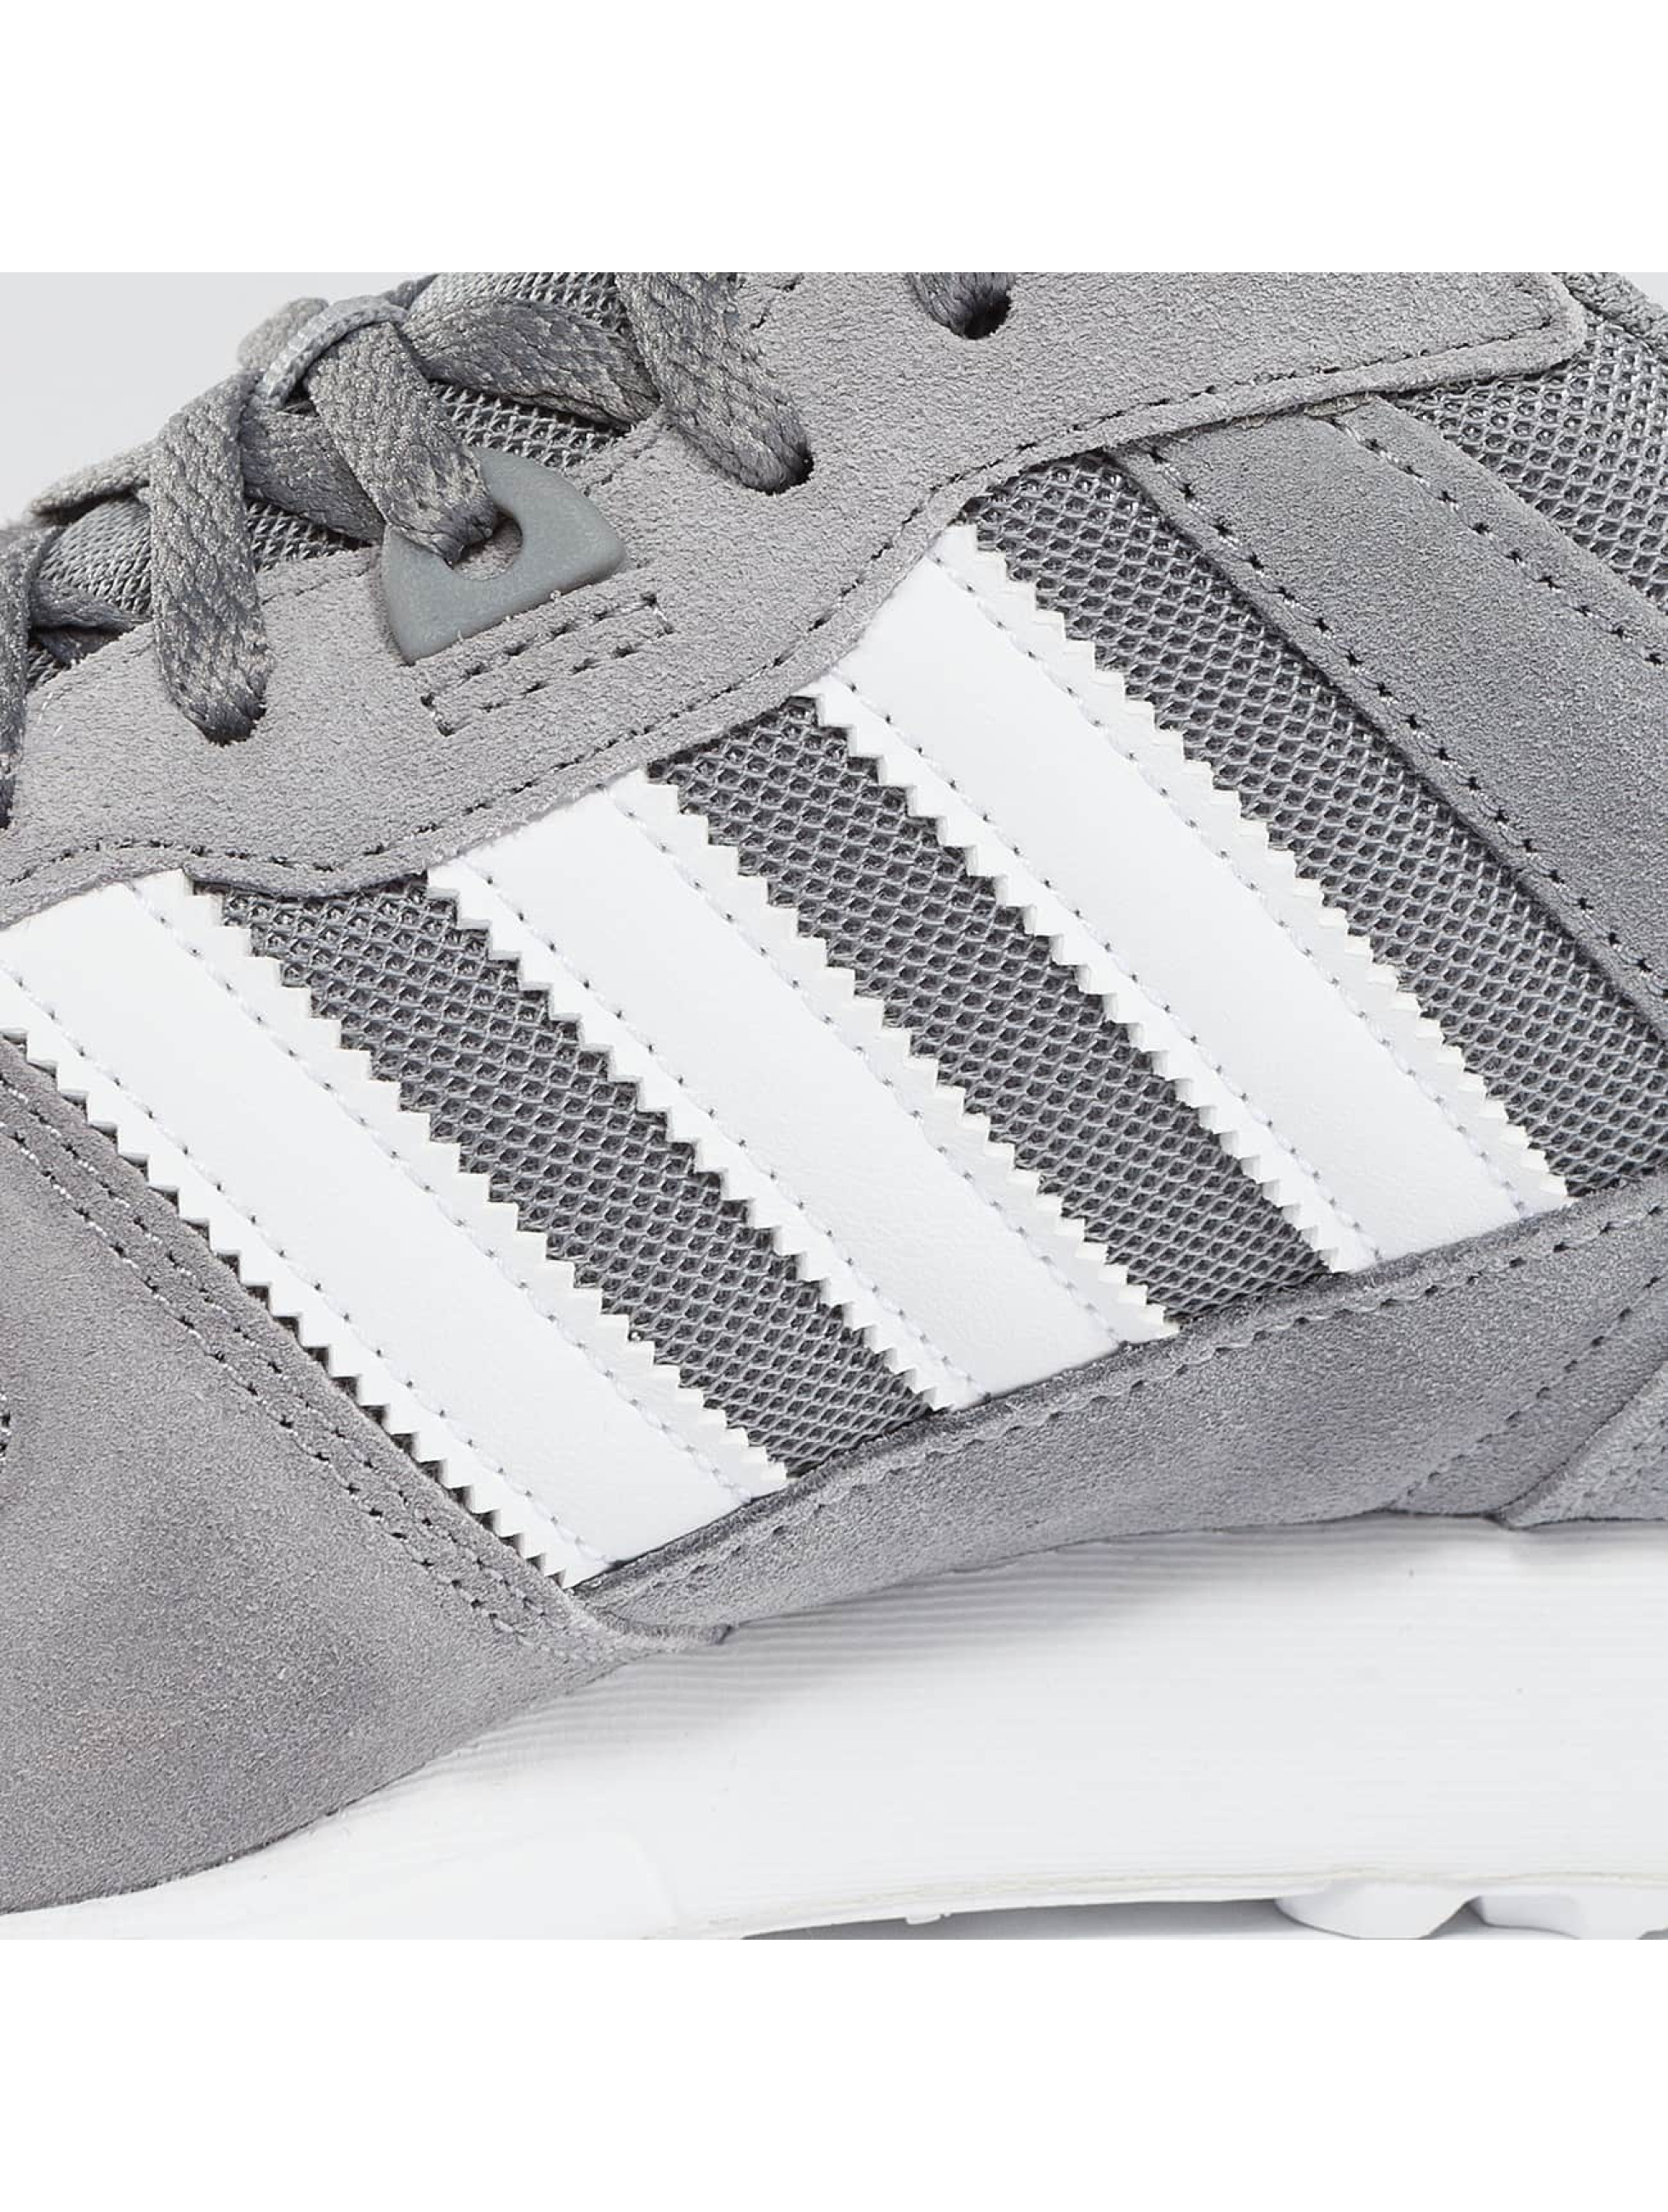 b6b23cc6b97 ... adidas grå sneakers - https://cdn.def-shop.com/ ...